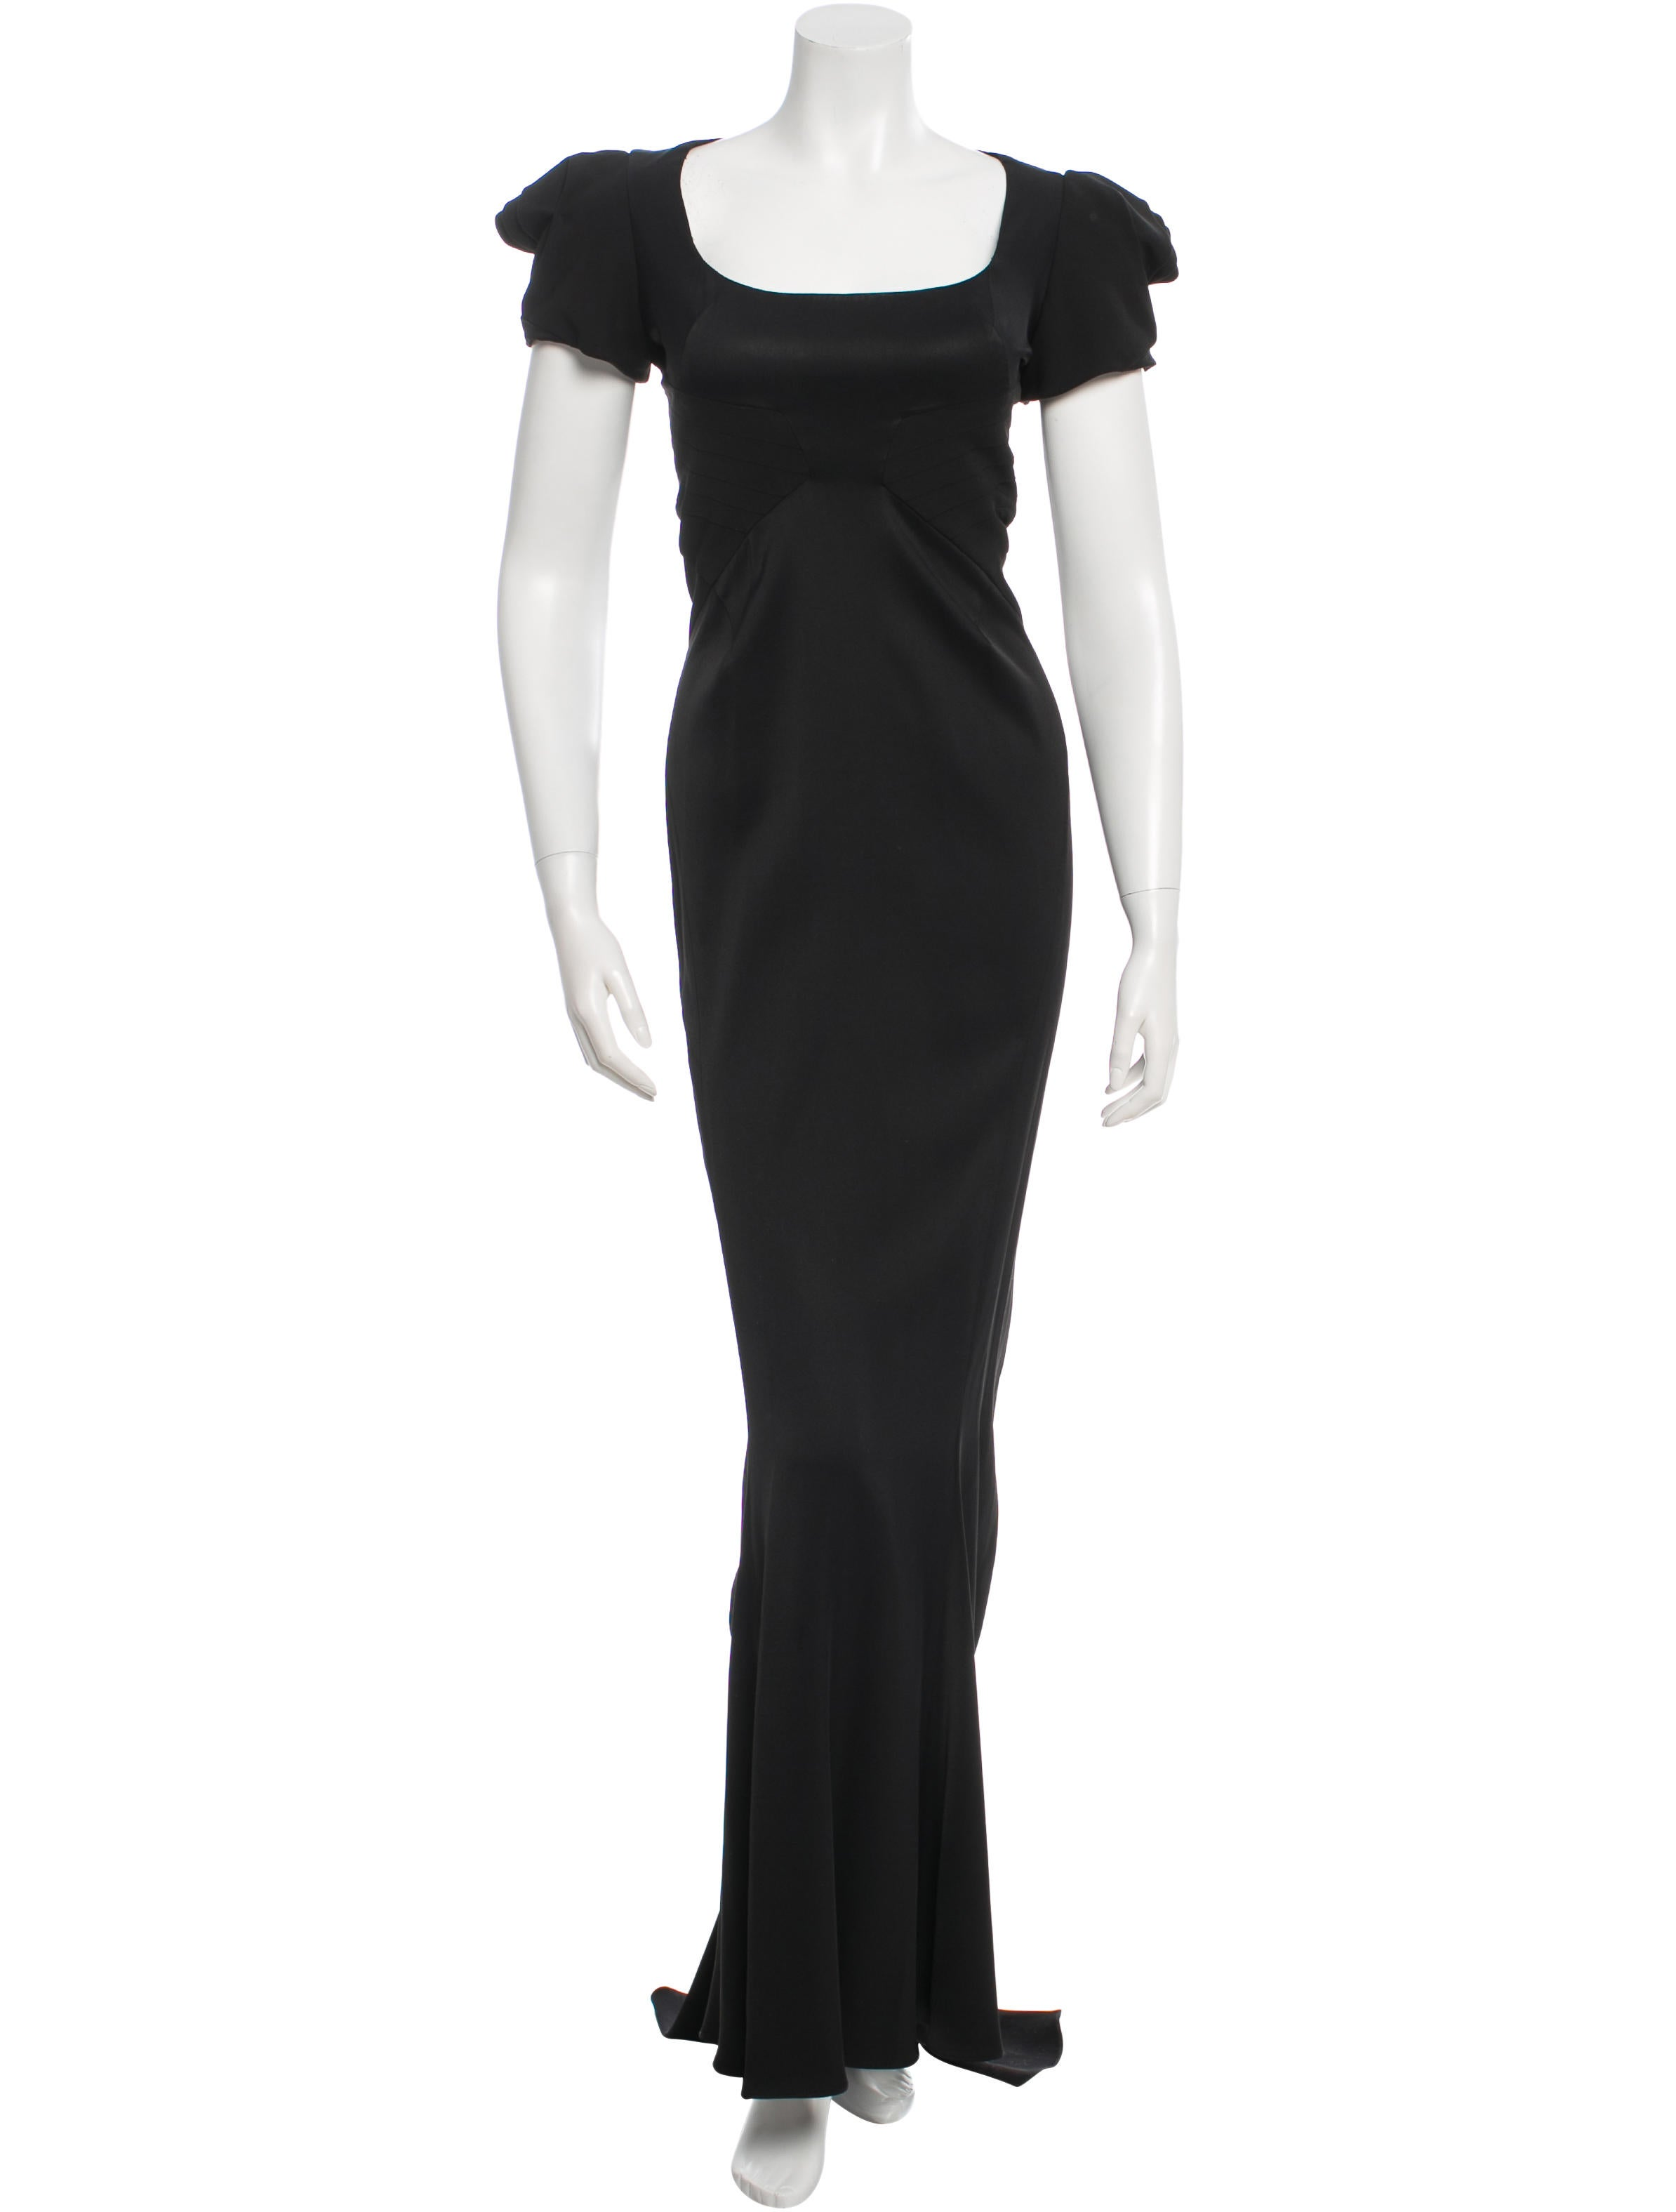 Zac Posen Satin Evening Gown - Clothing - ZAC22614   The RealReal